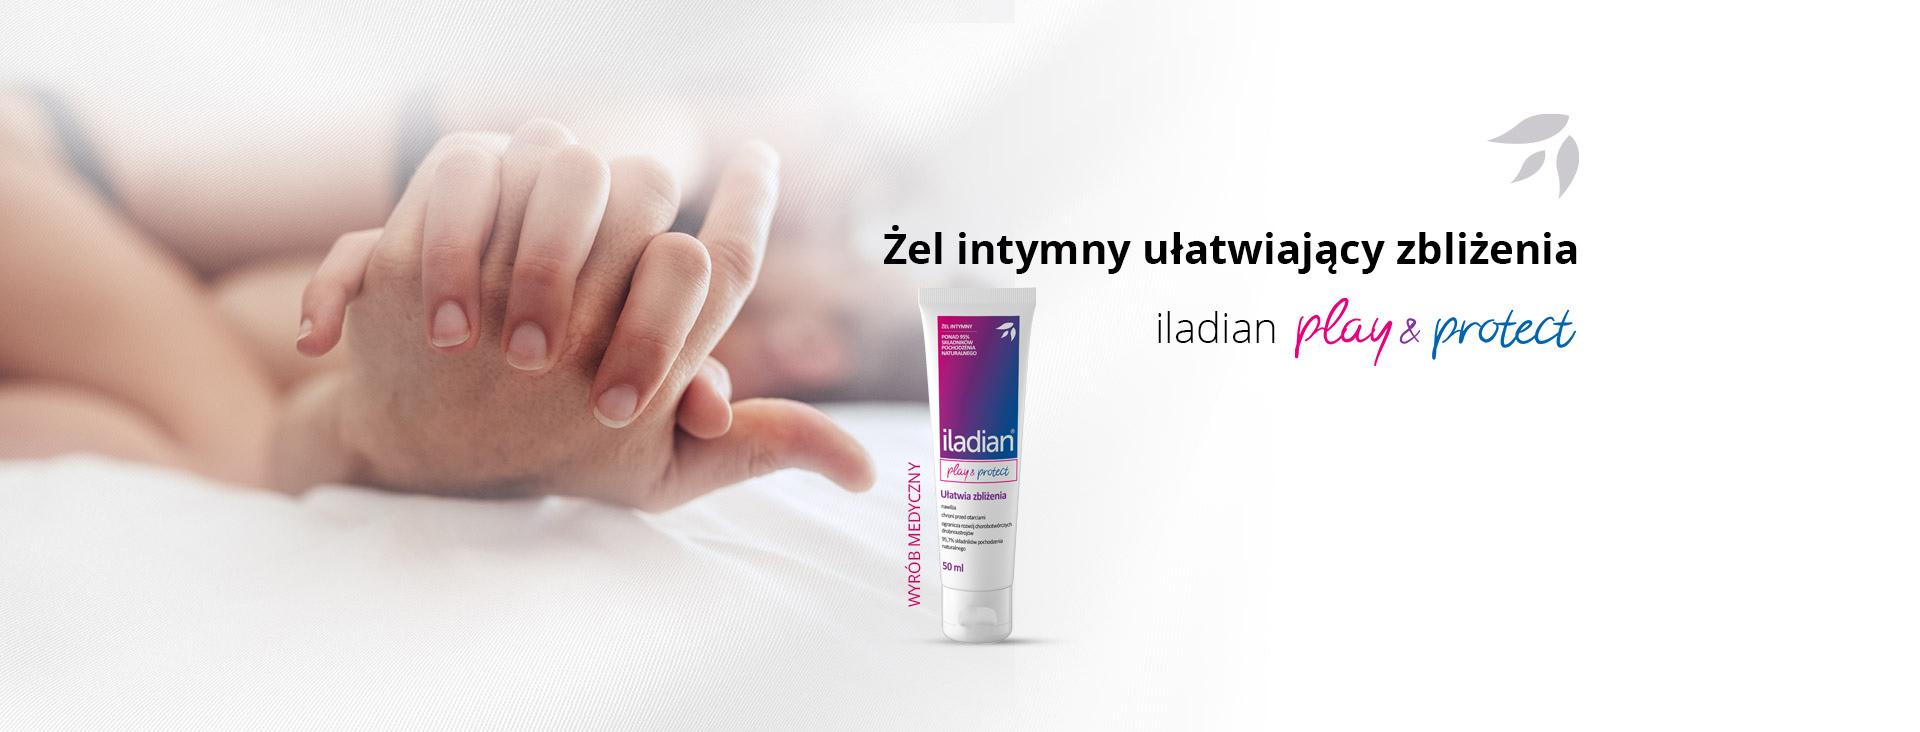 Iladian Play